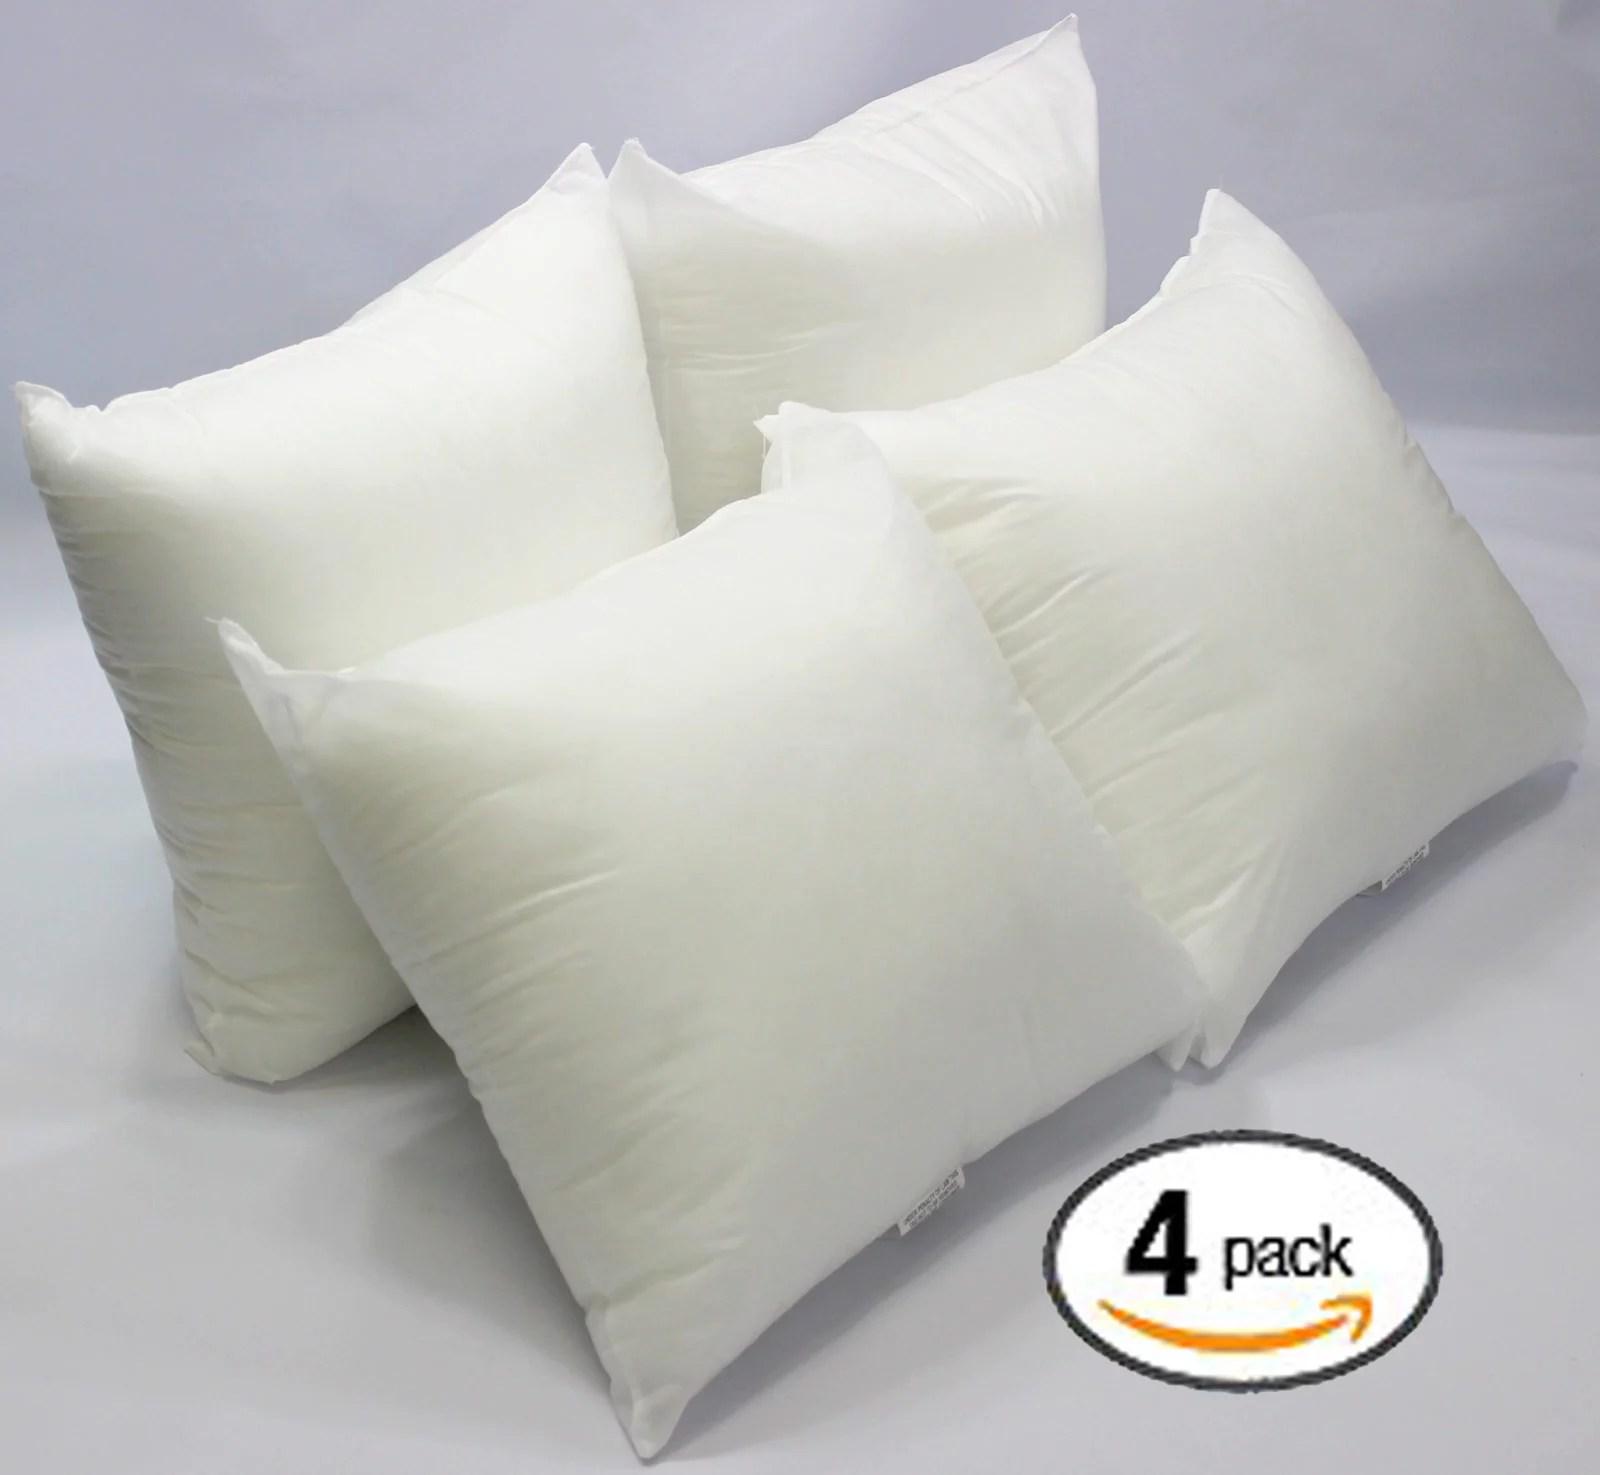 set of 4 18 x 18 premium hypoallergenic stuffer pillow insert sham square form polyester standard white made in usa